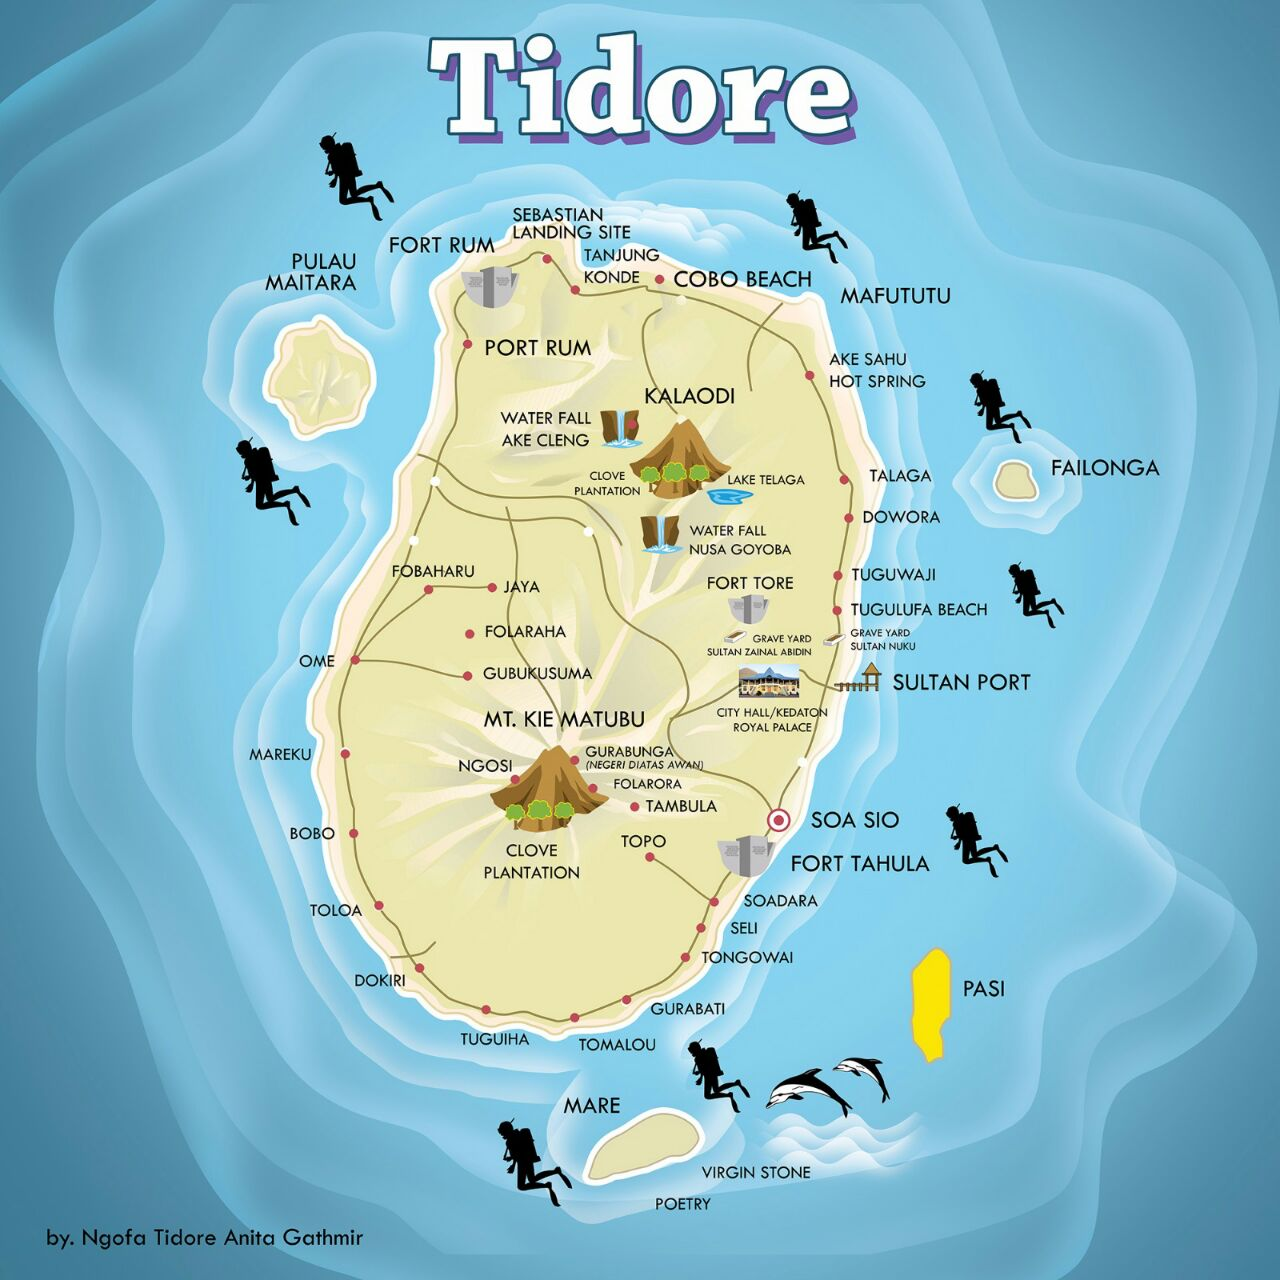 BLOGGER GATHERING - Lomba Menulis Blog Tentang Tidore